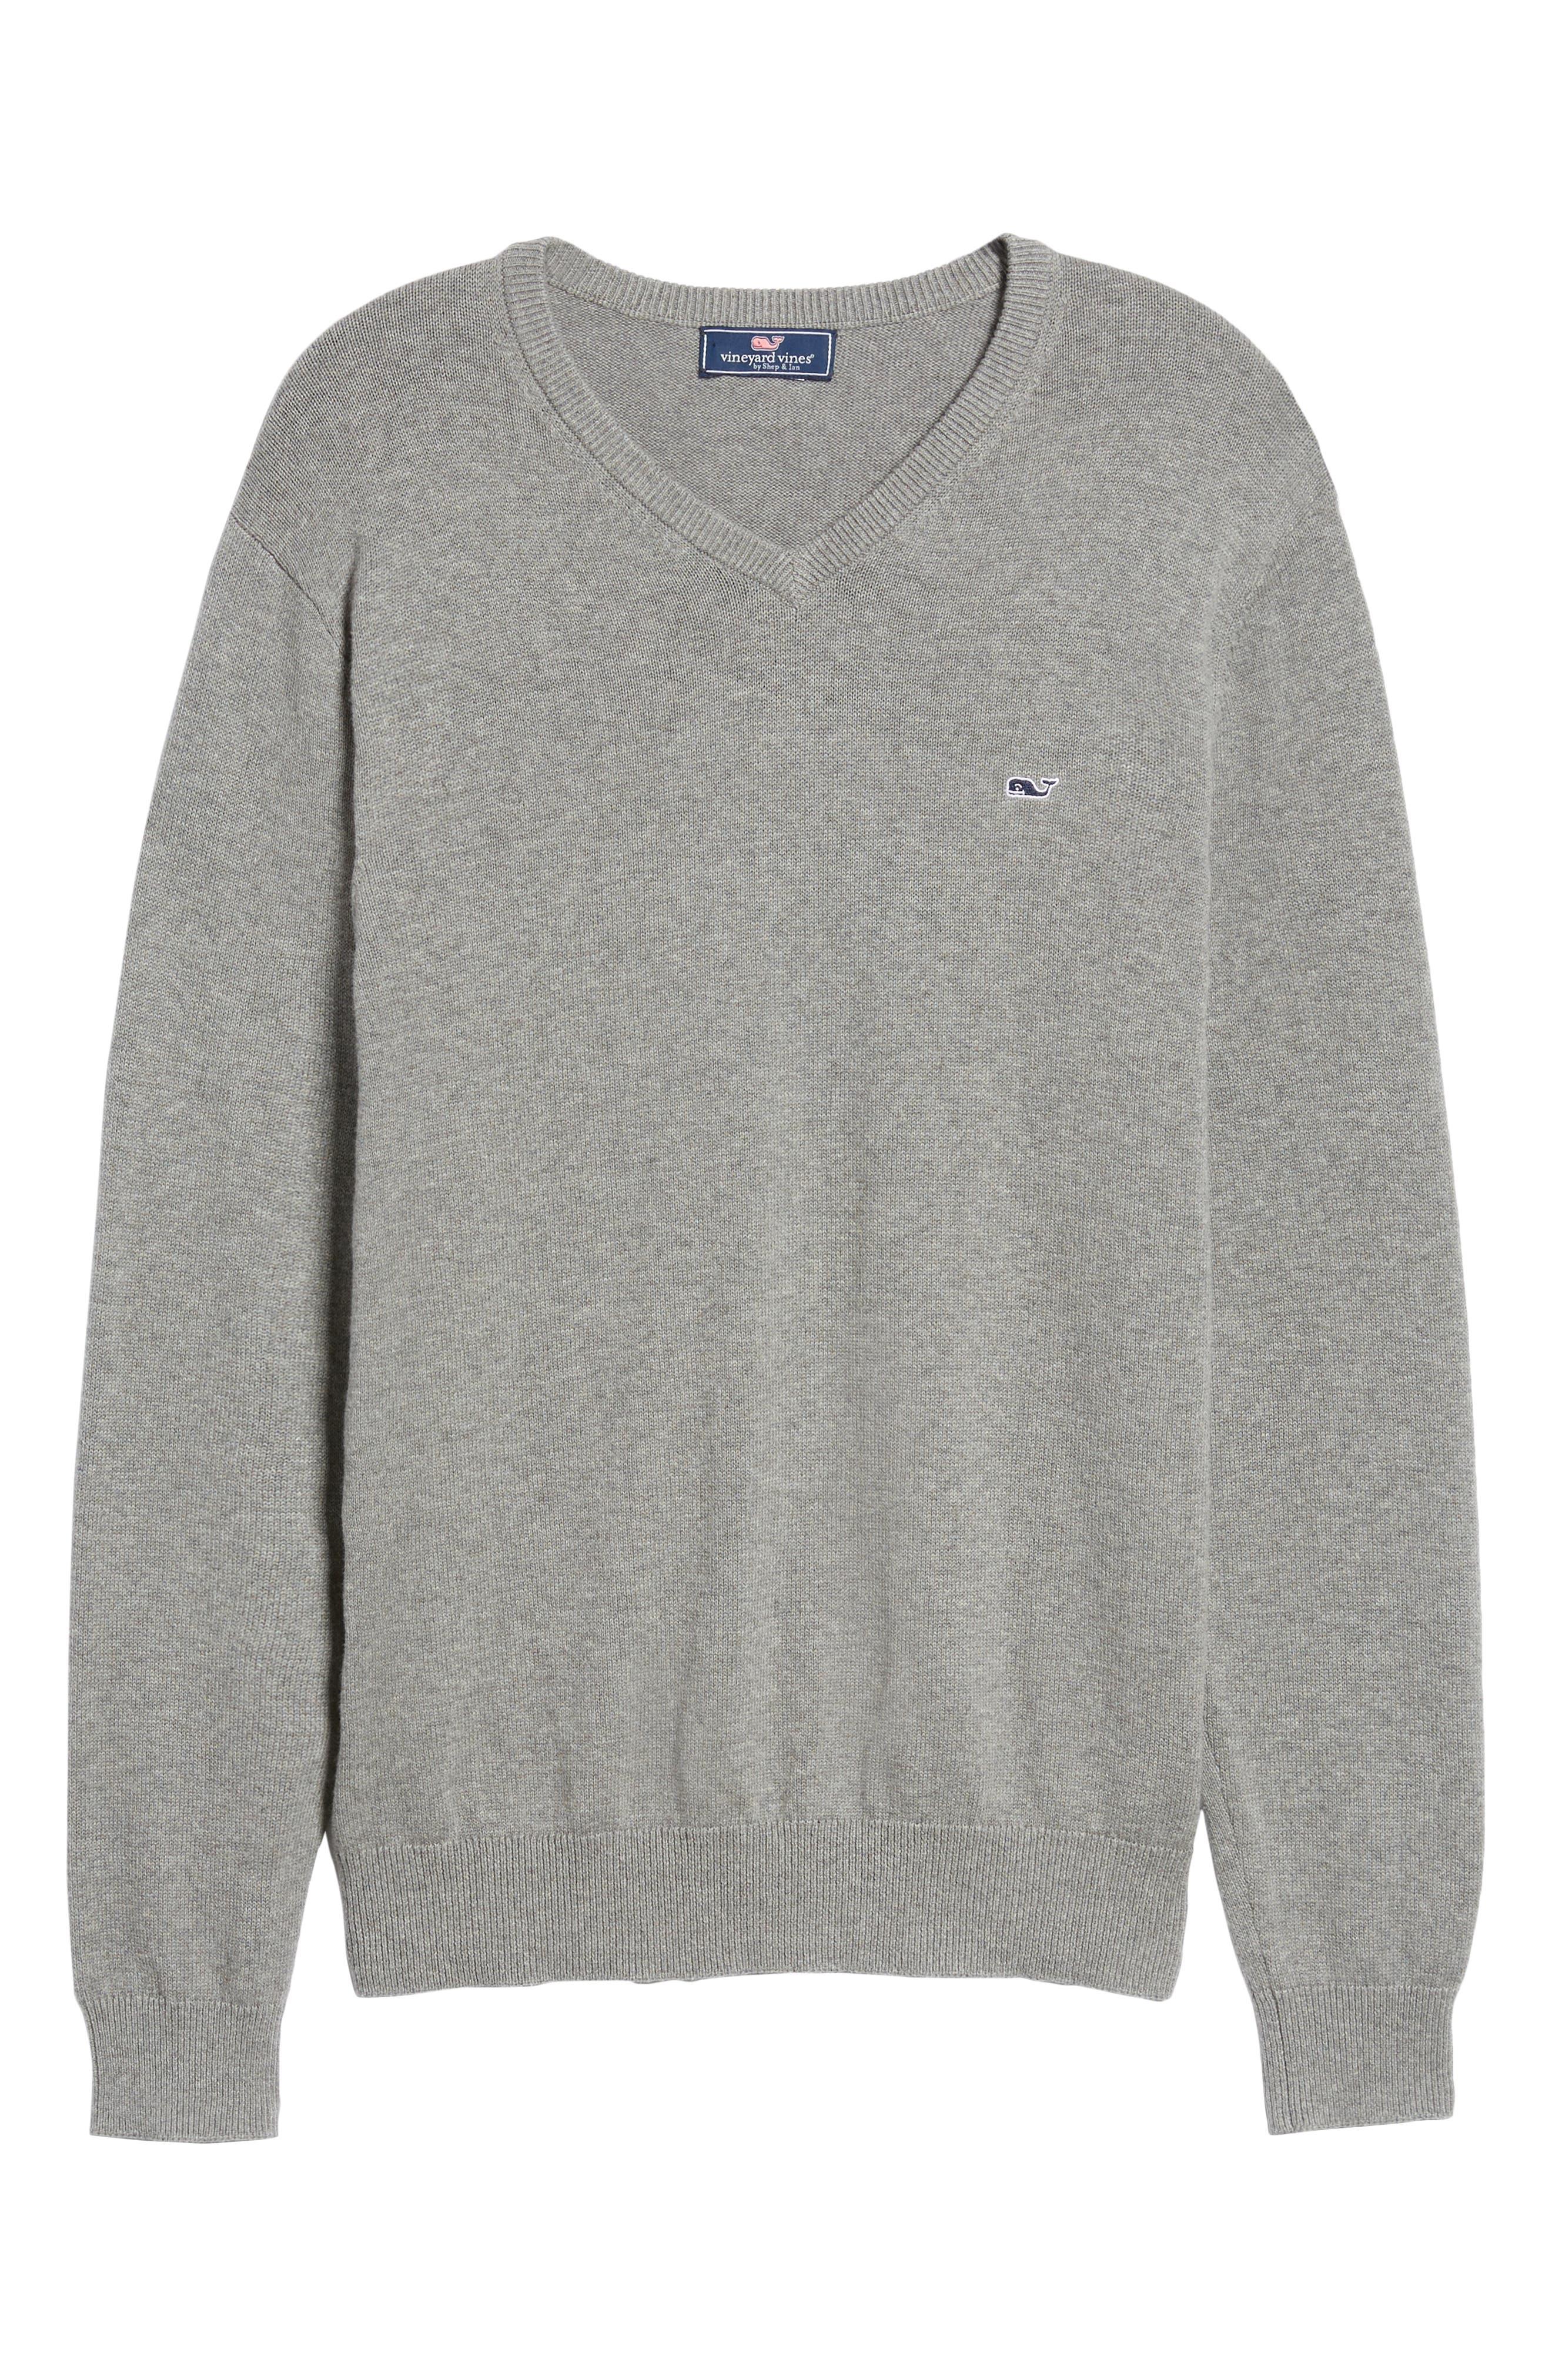 Cotton & Cashmere V-Neck Sweater,                             Alternate thumbnail 6, color,                             GRAY HEATHER